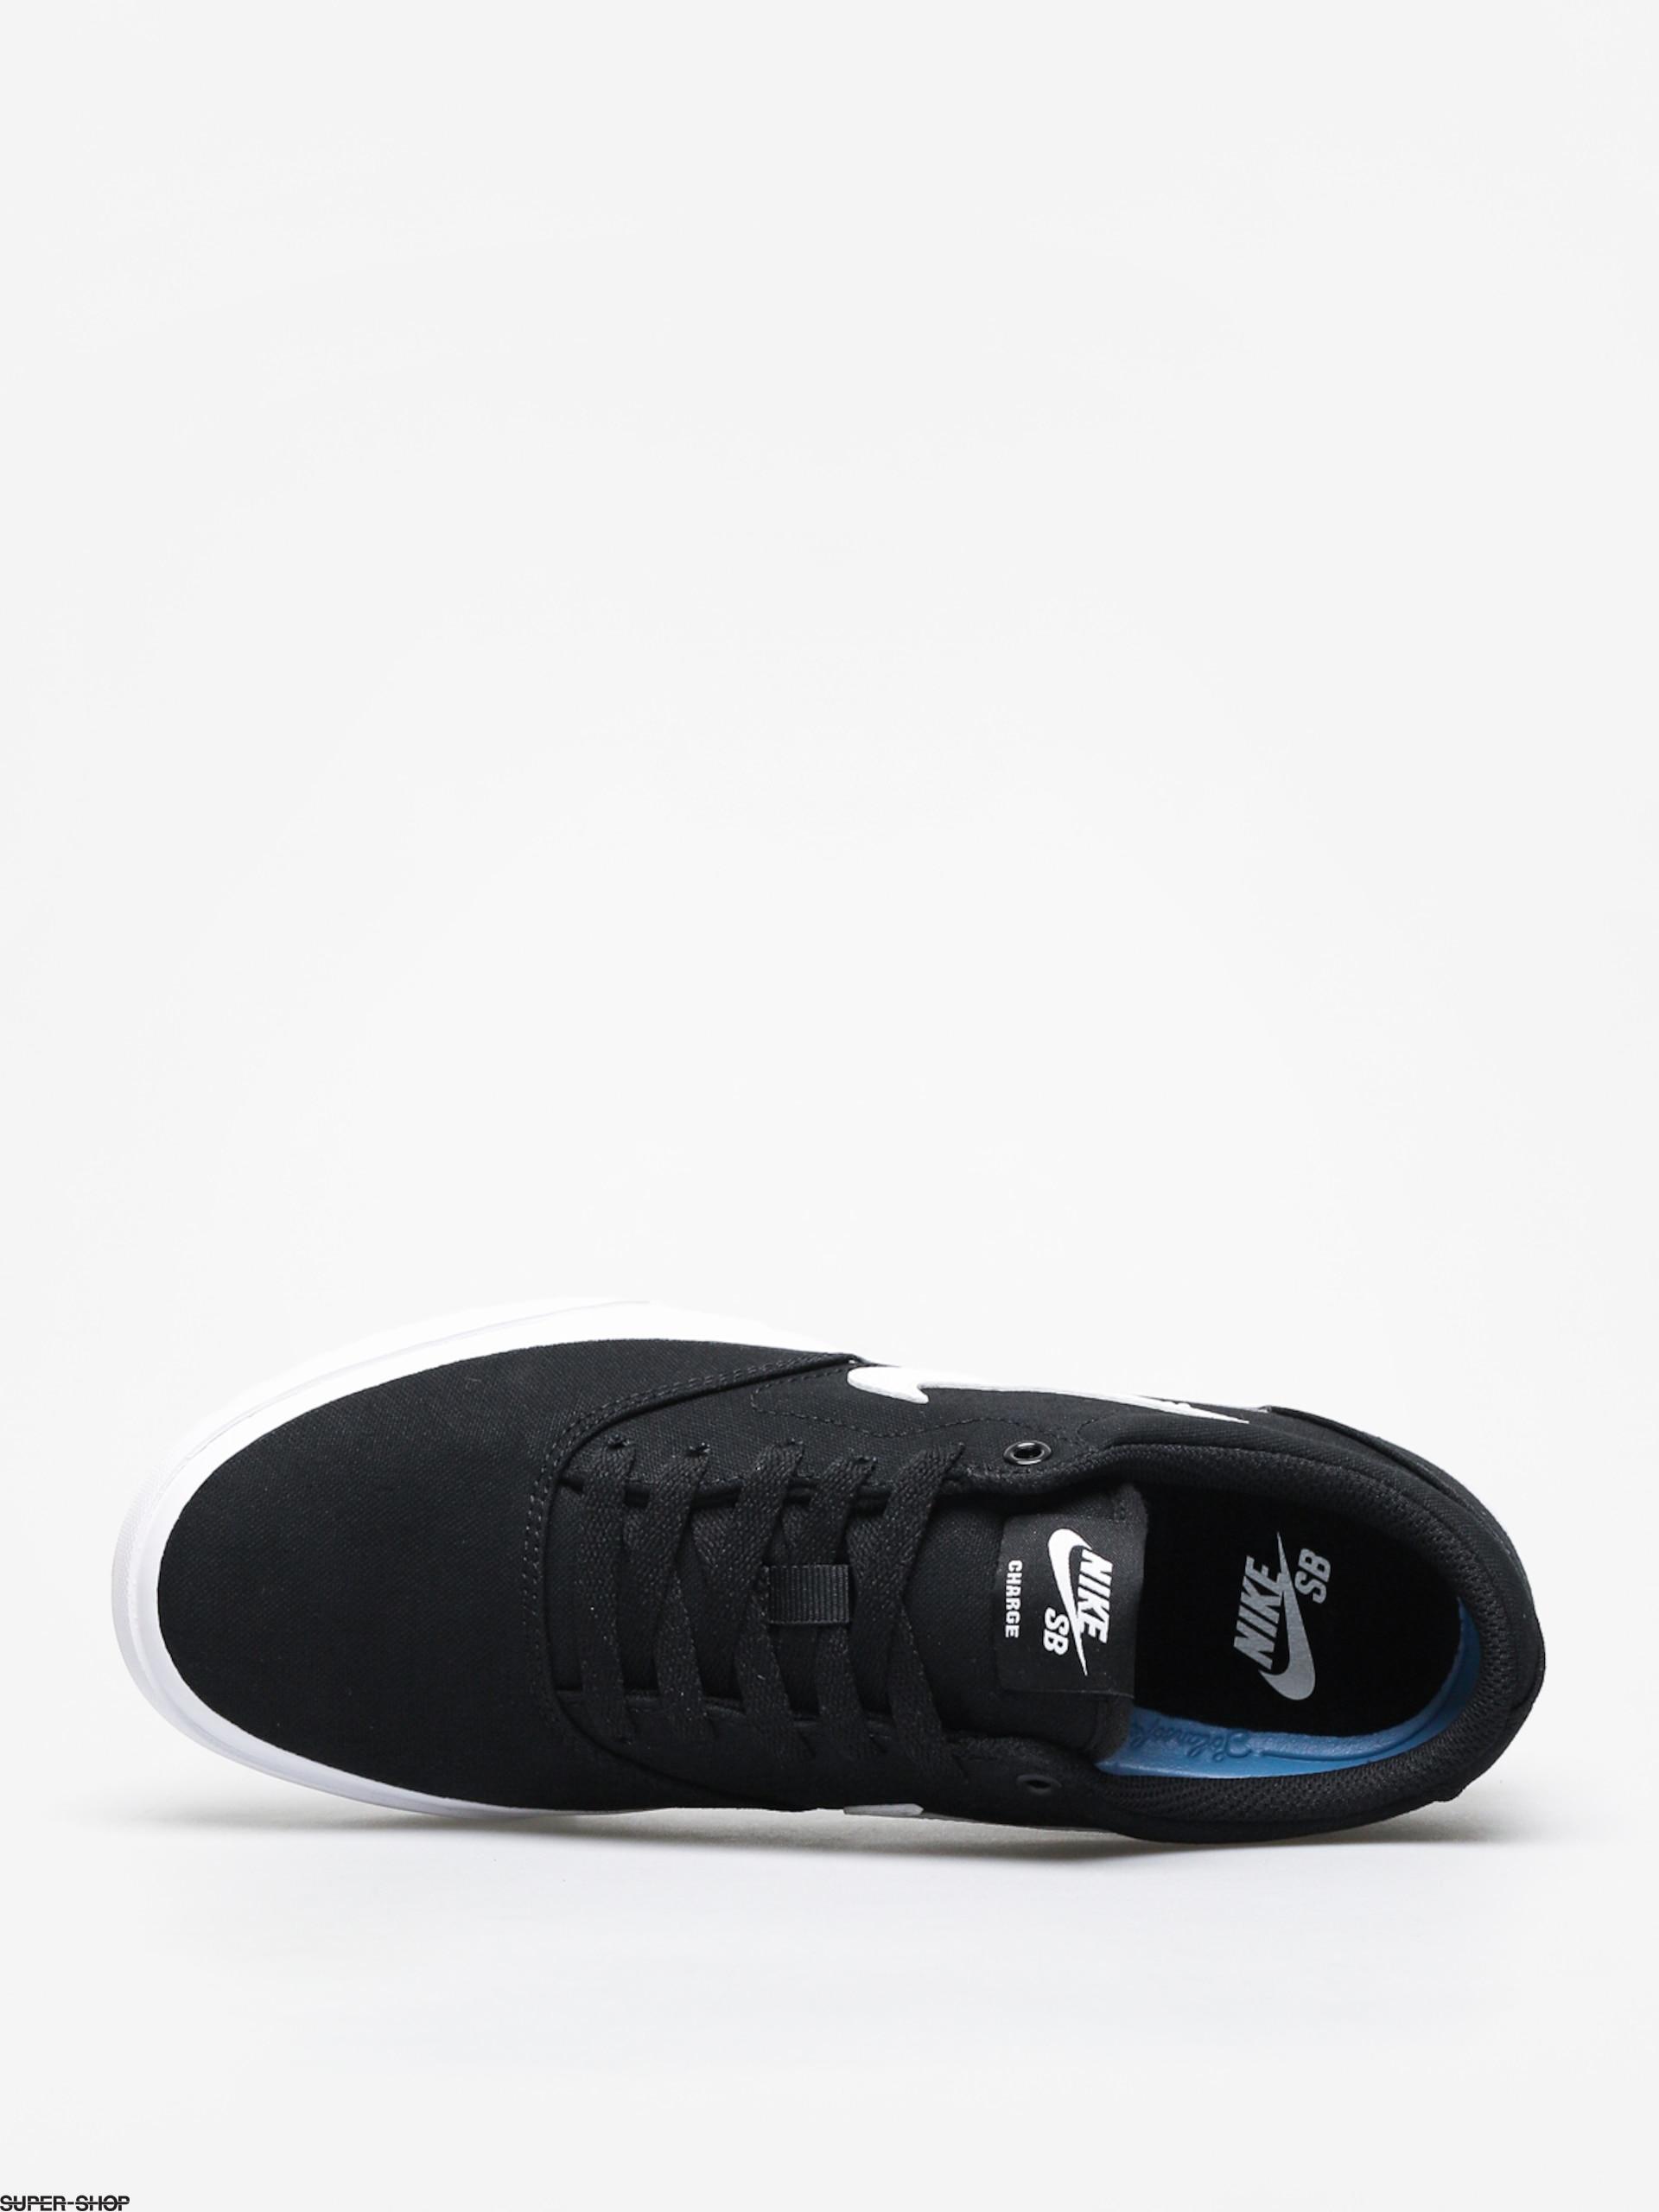 brand new 51f1b 6c845 Nike SB Charge Slr Shoes (black white)